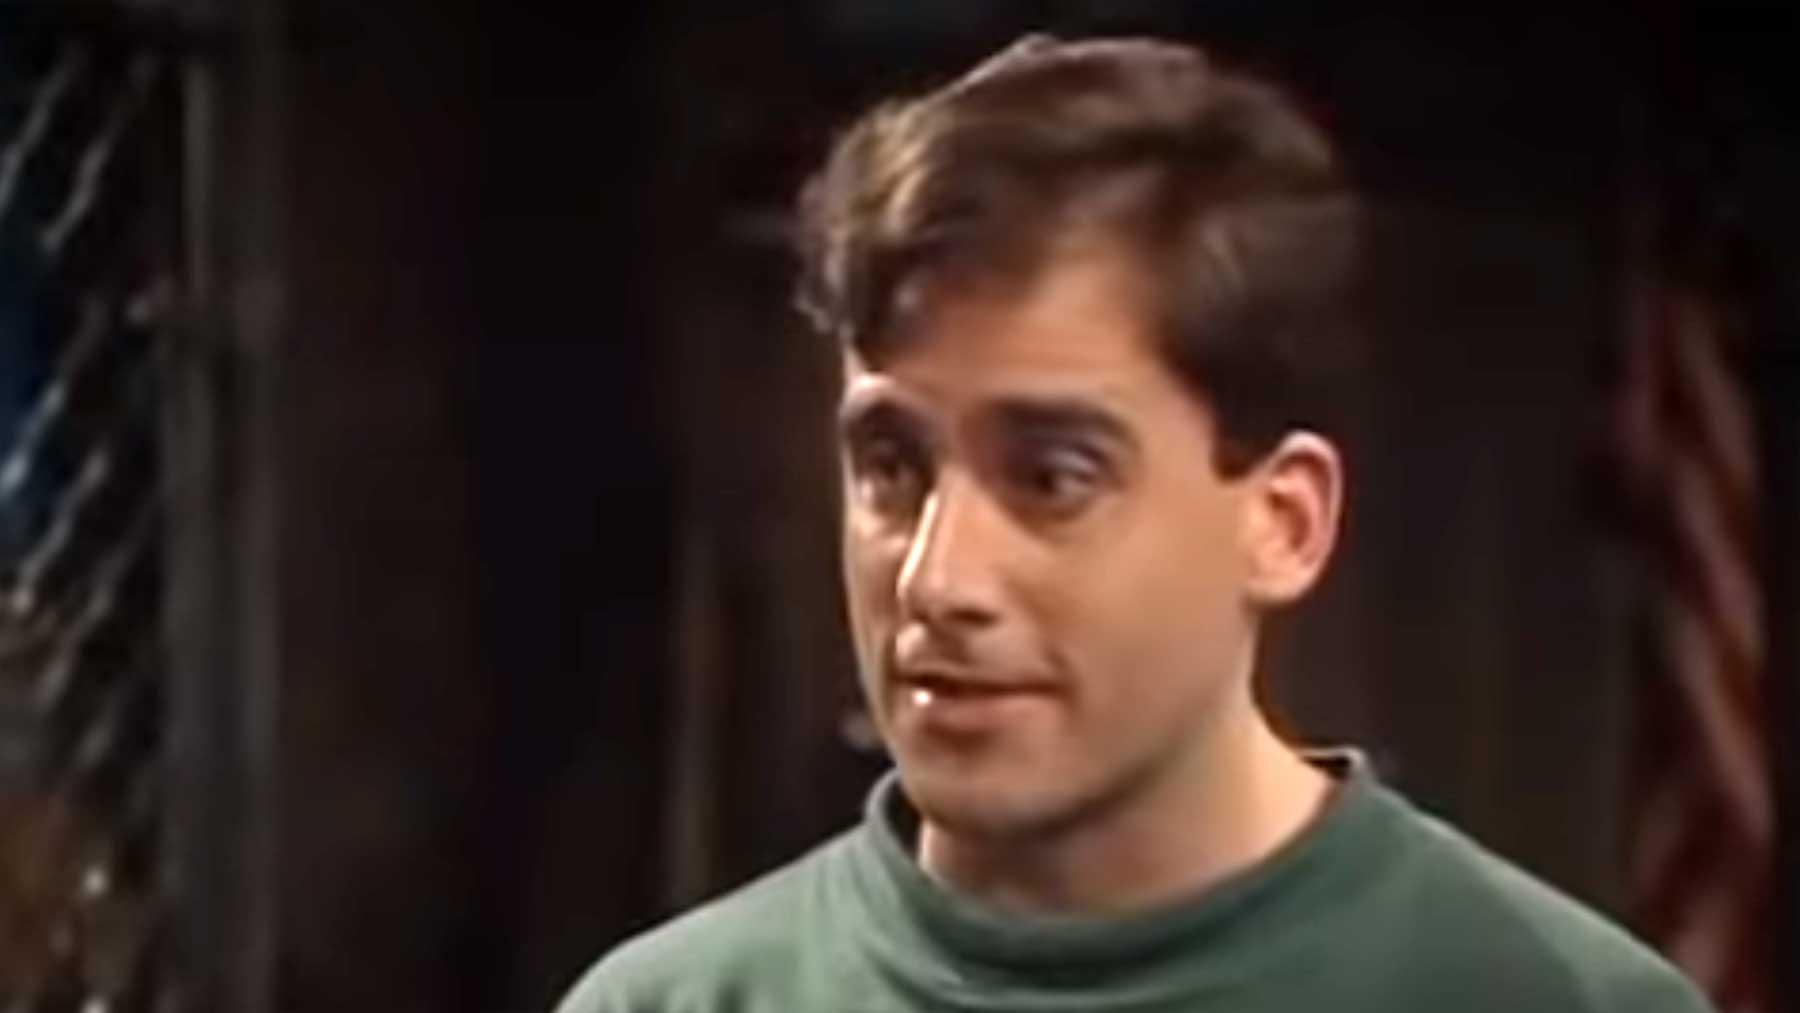 Steve Carrell in einem Sketch aus dem Jahr 1994 steve-carell-1994-sketch-comedy